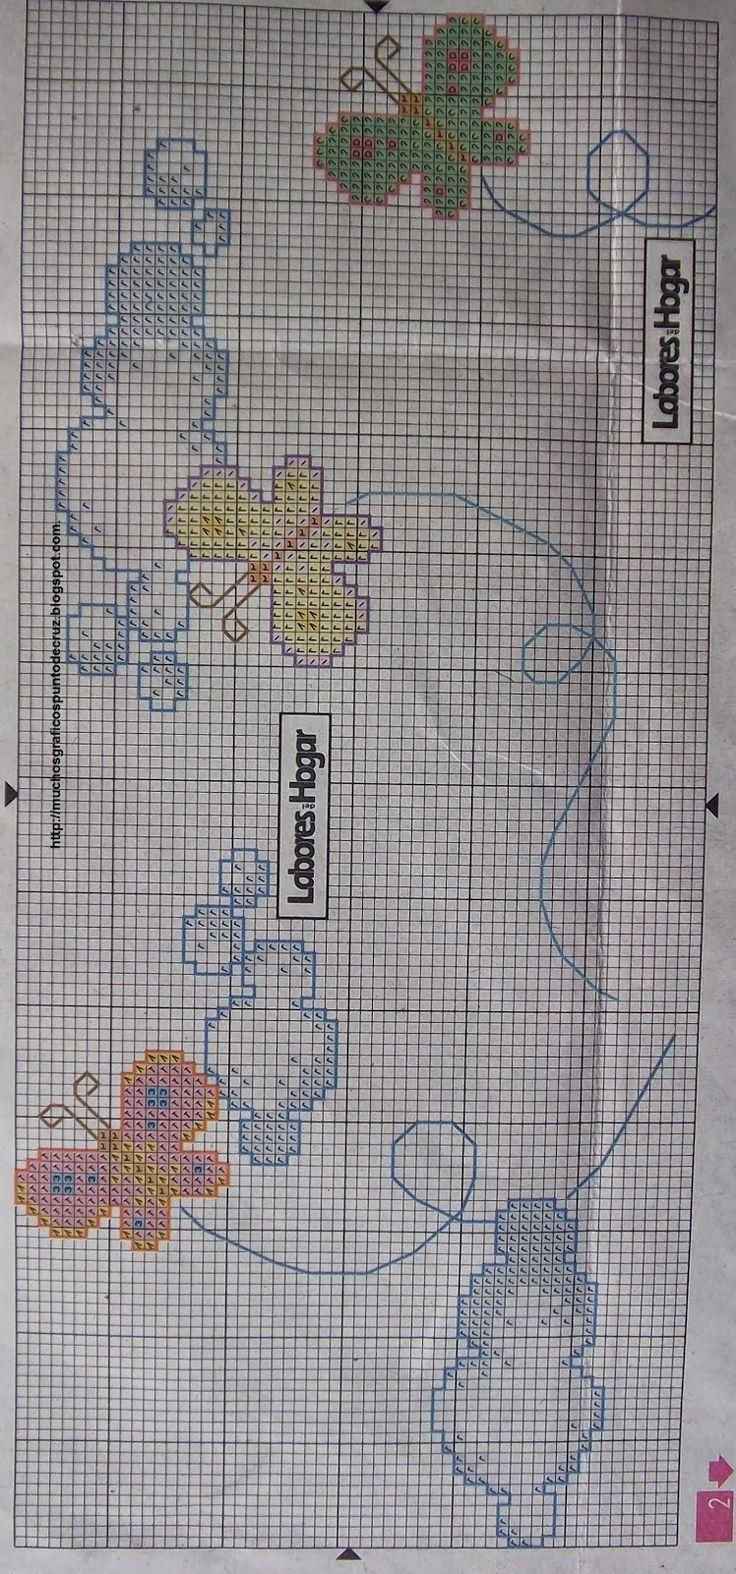 colcha-cuna-animales-1.JPG 748×1.600 pixel